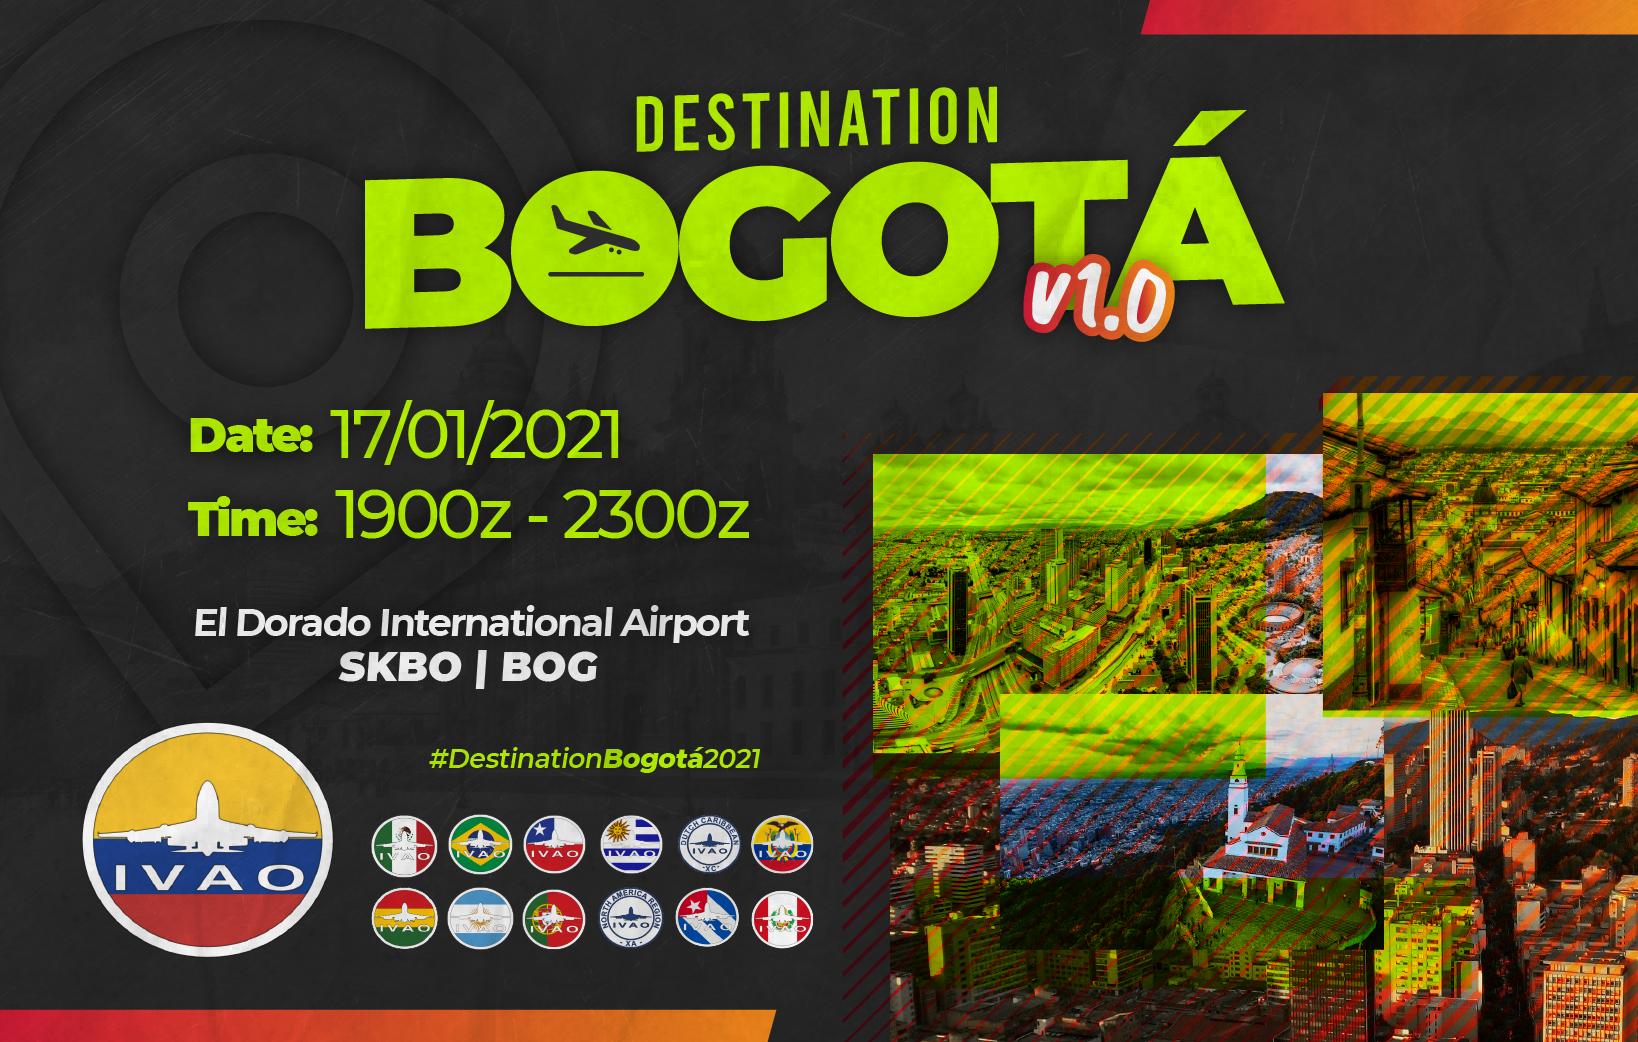 [CO+AR+BO+BR+CL+CU+EC+PT+PE+MX+UY+XA+XC] Destination Bogotá V1.0